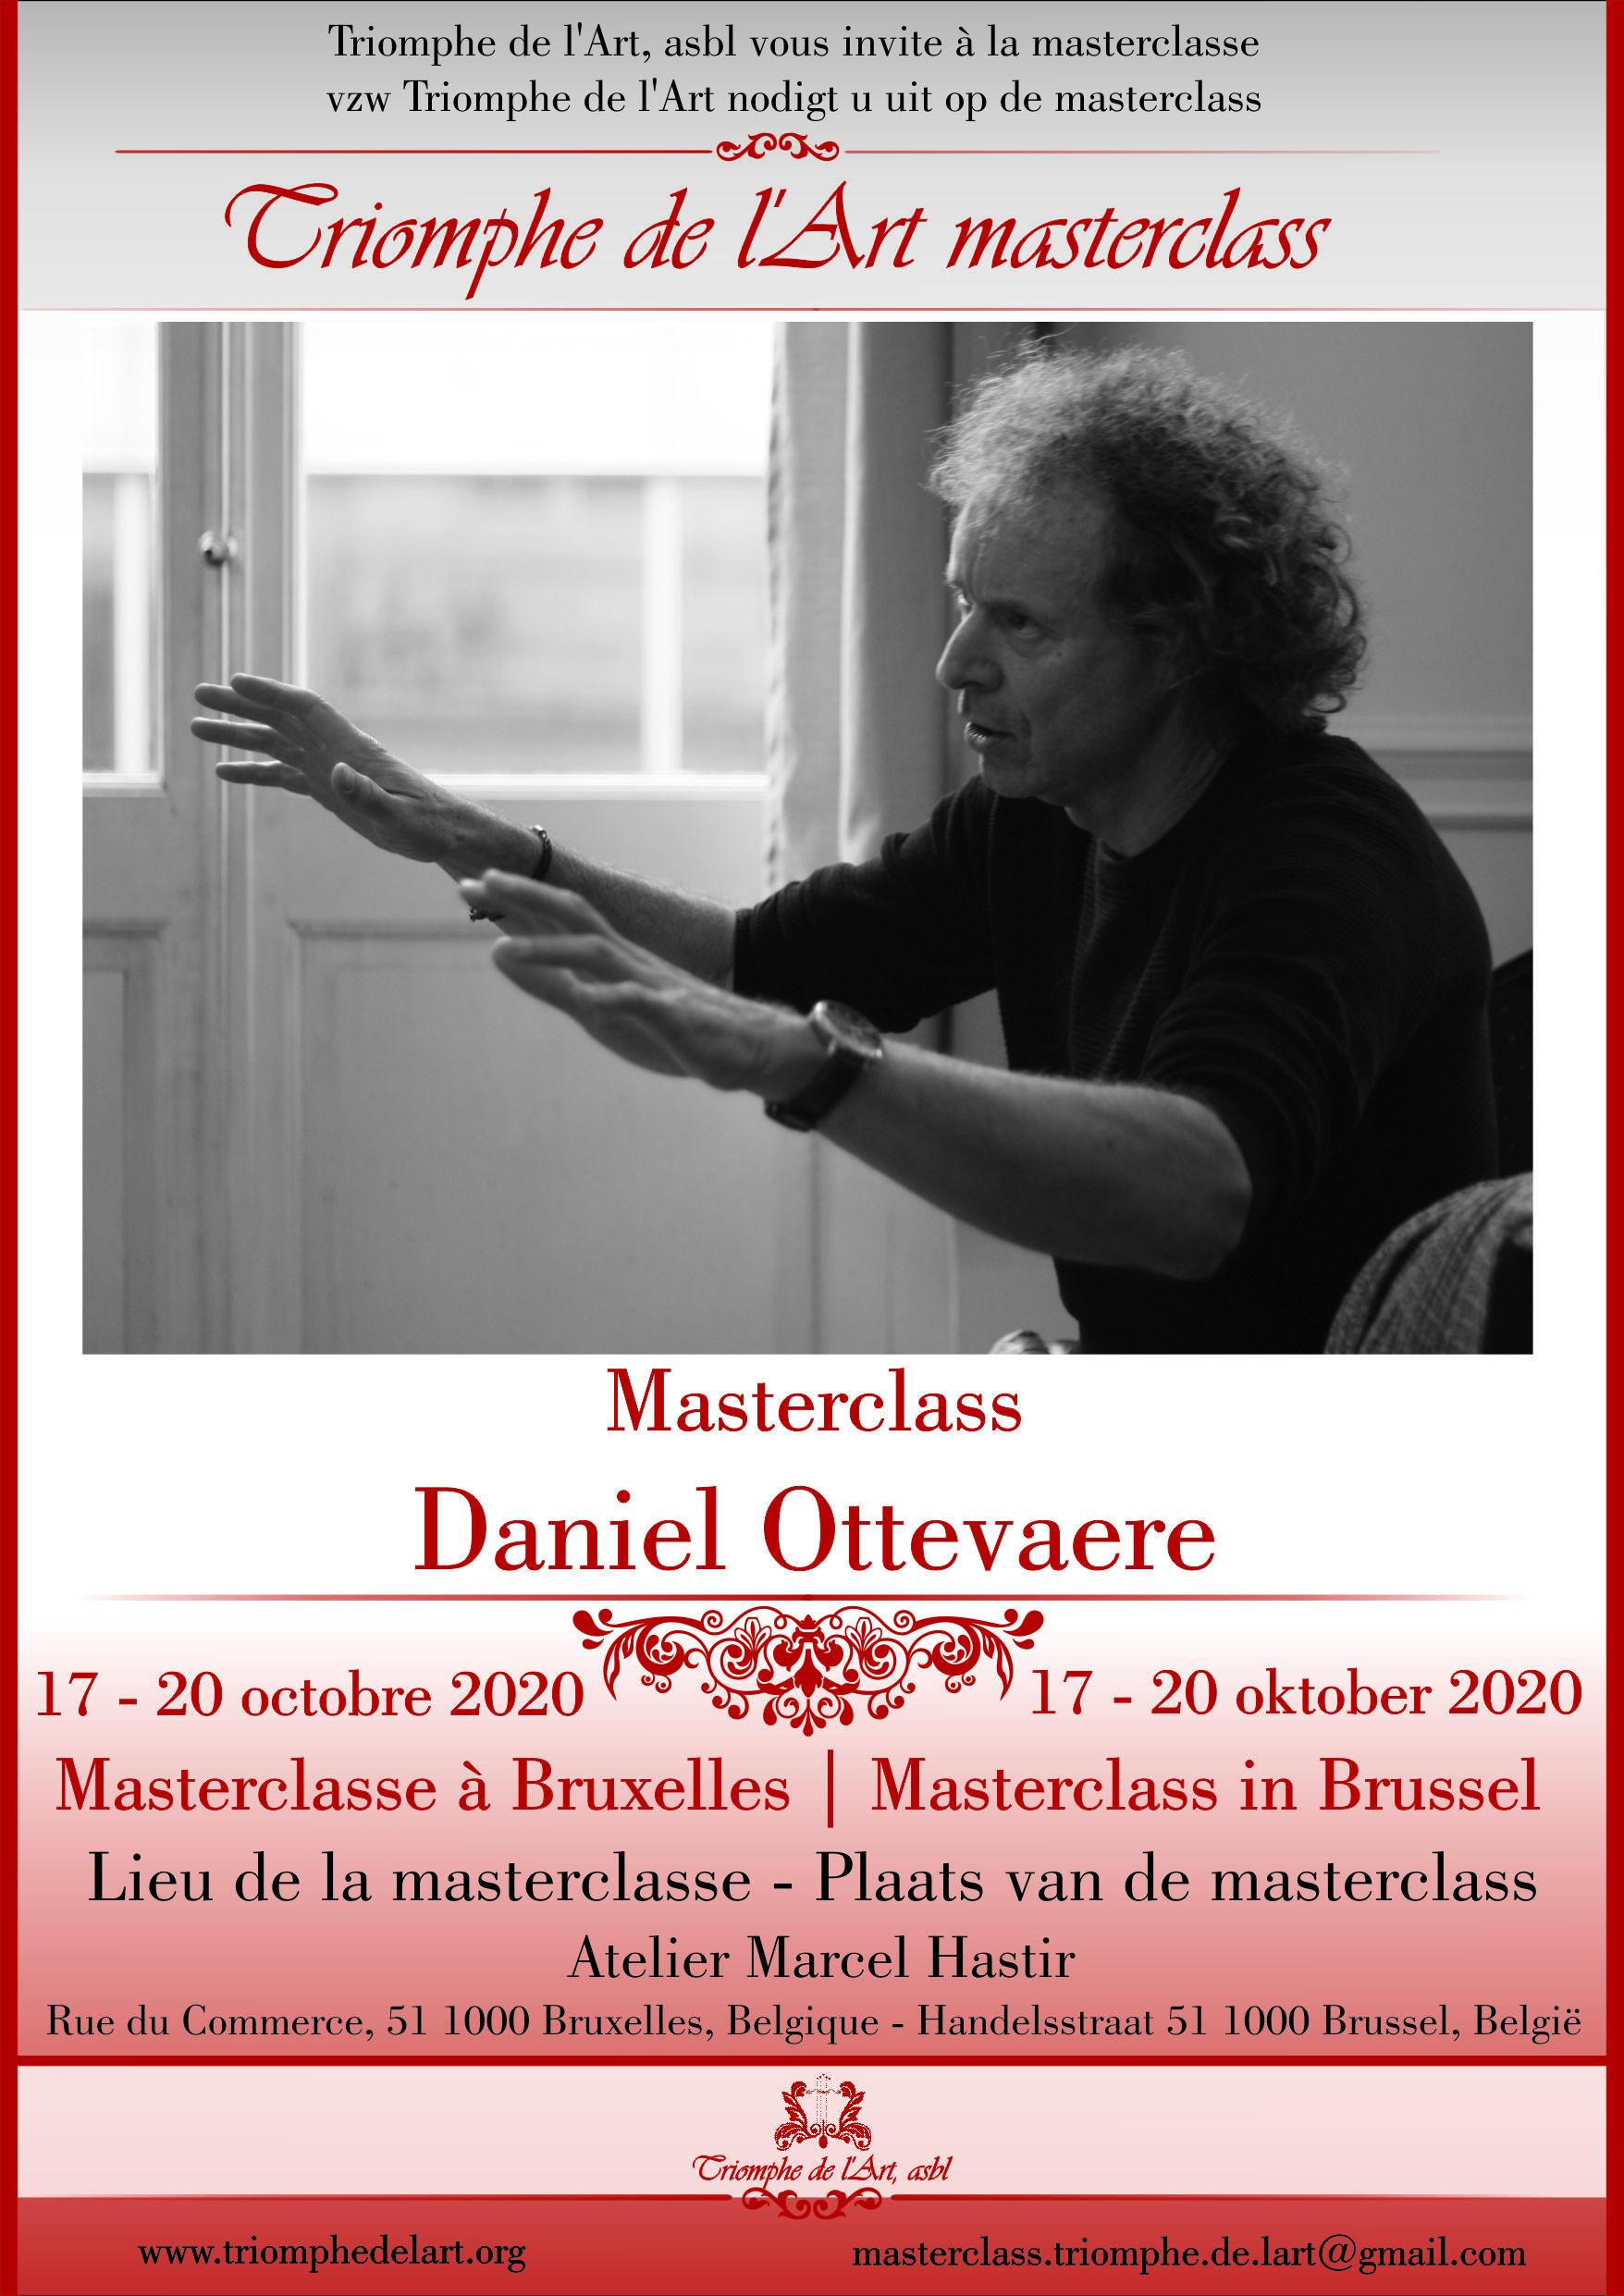 Daniel Ottevaere masterclass octobre 2020